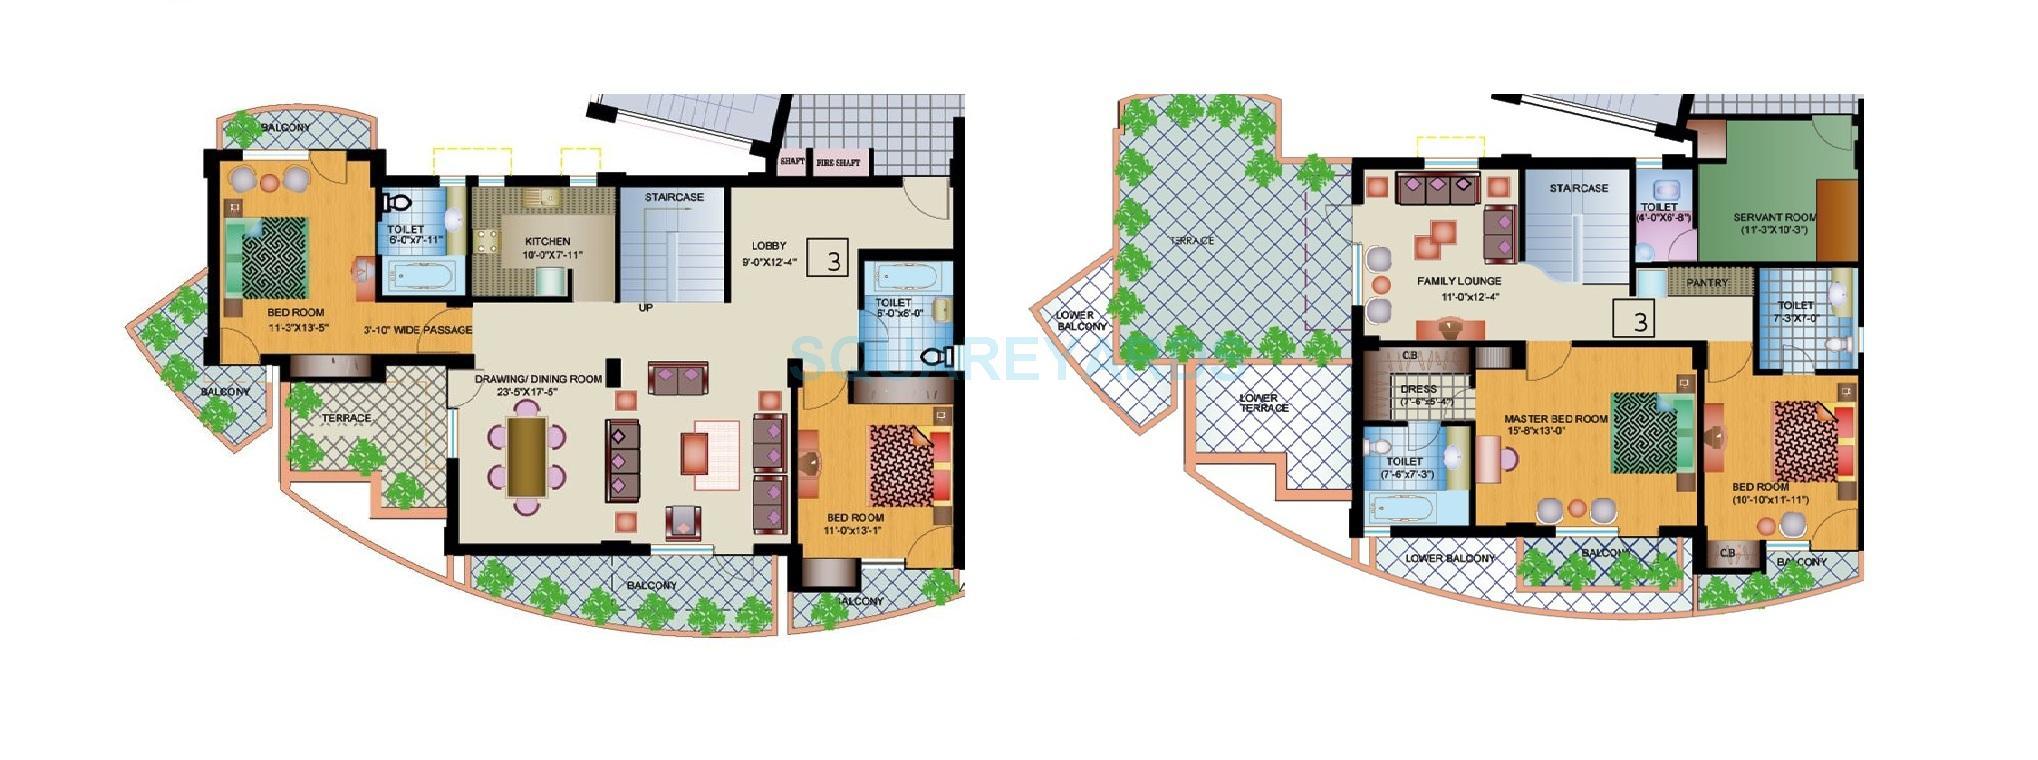 ansal buildwell ansal crown heights penthouse 4bhk 3074sqft 1